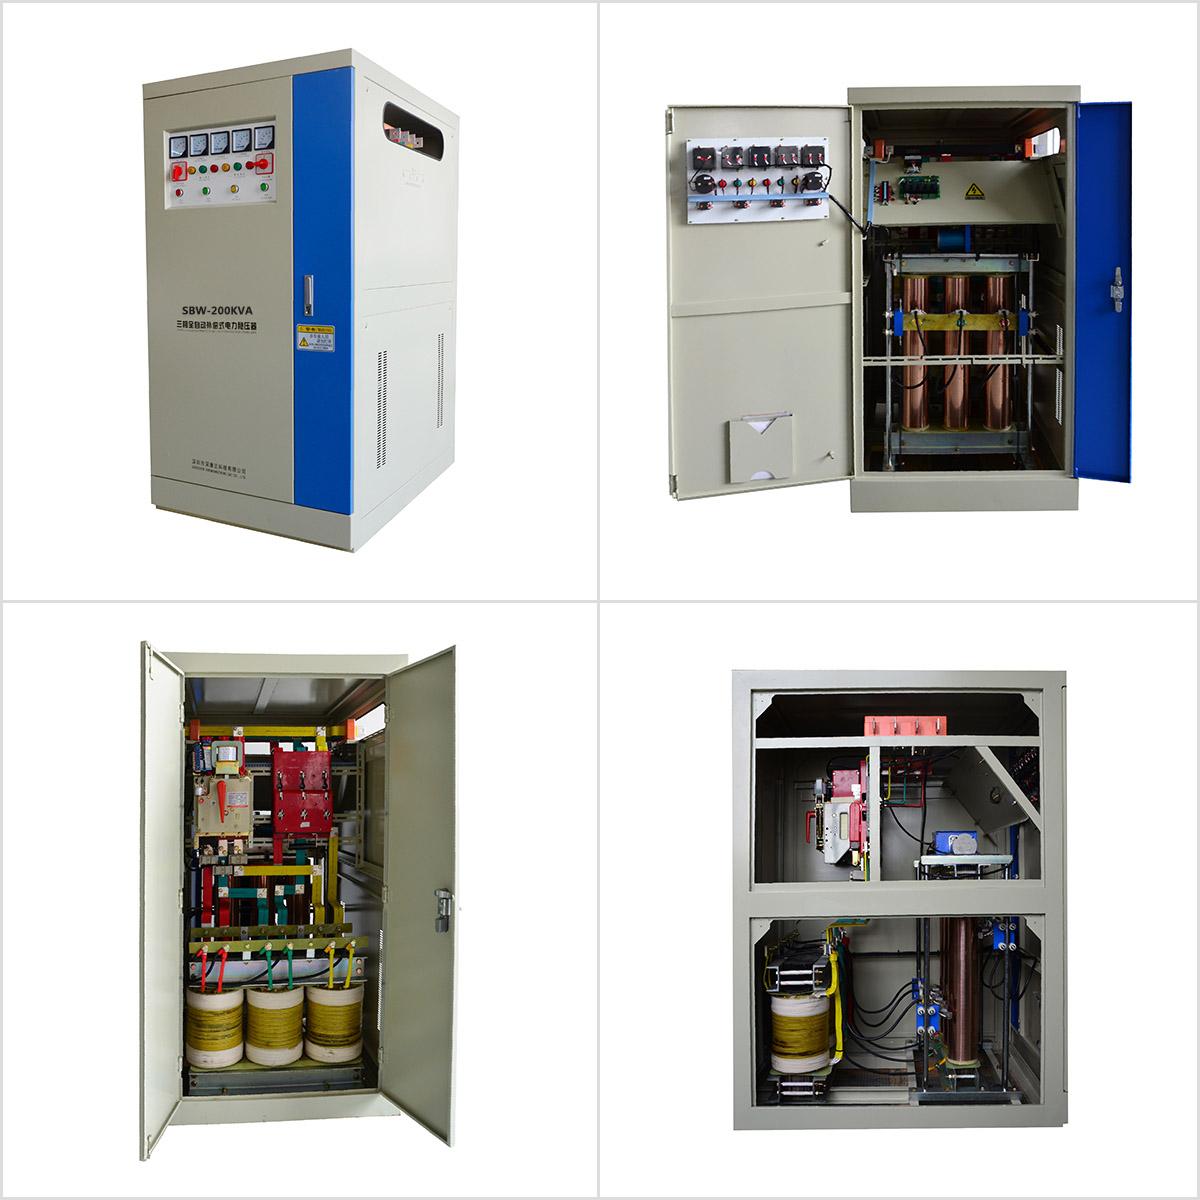 SBW Voltage Stabilizer 200KVA